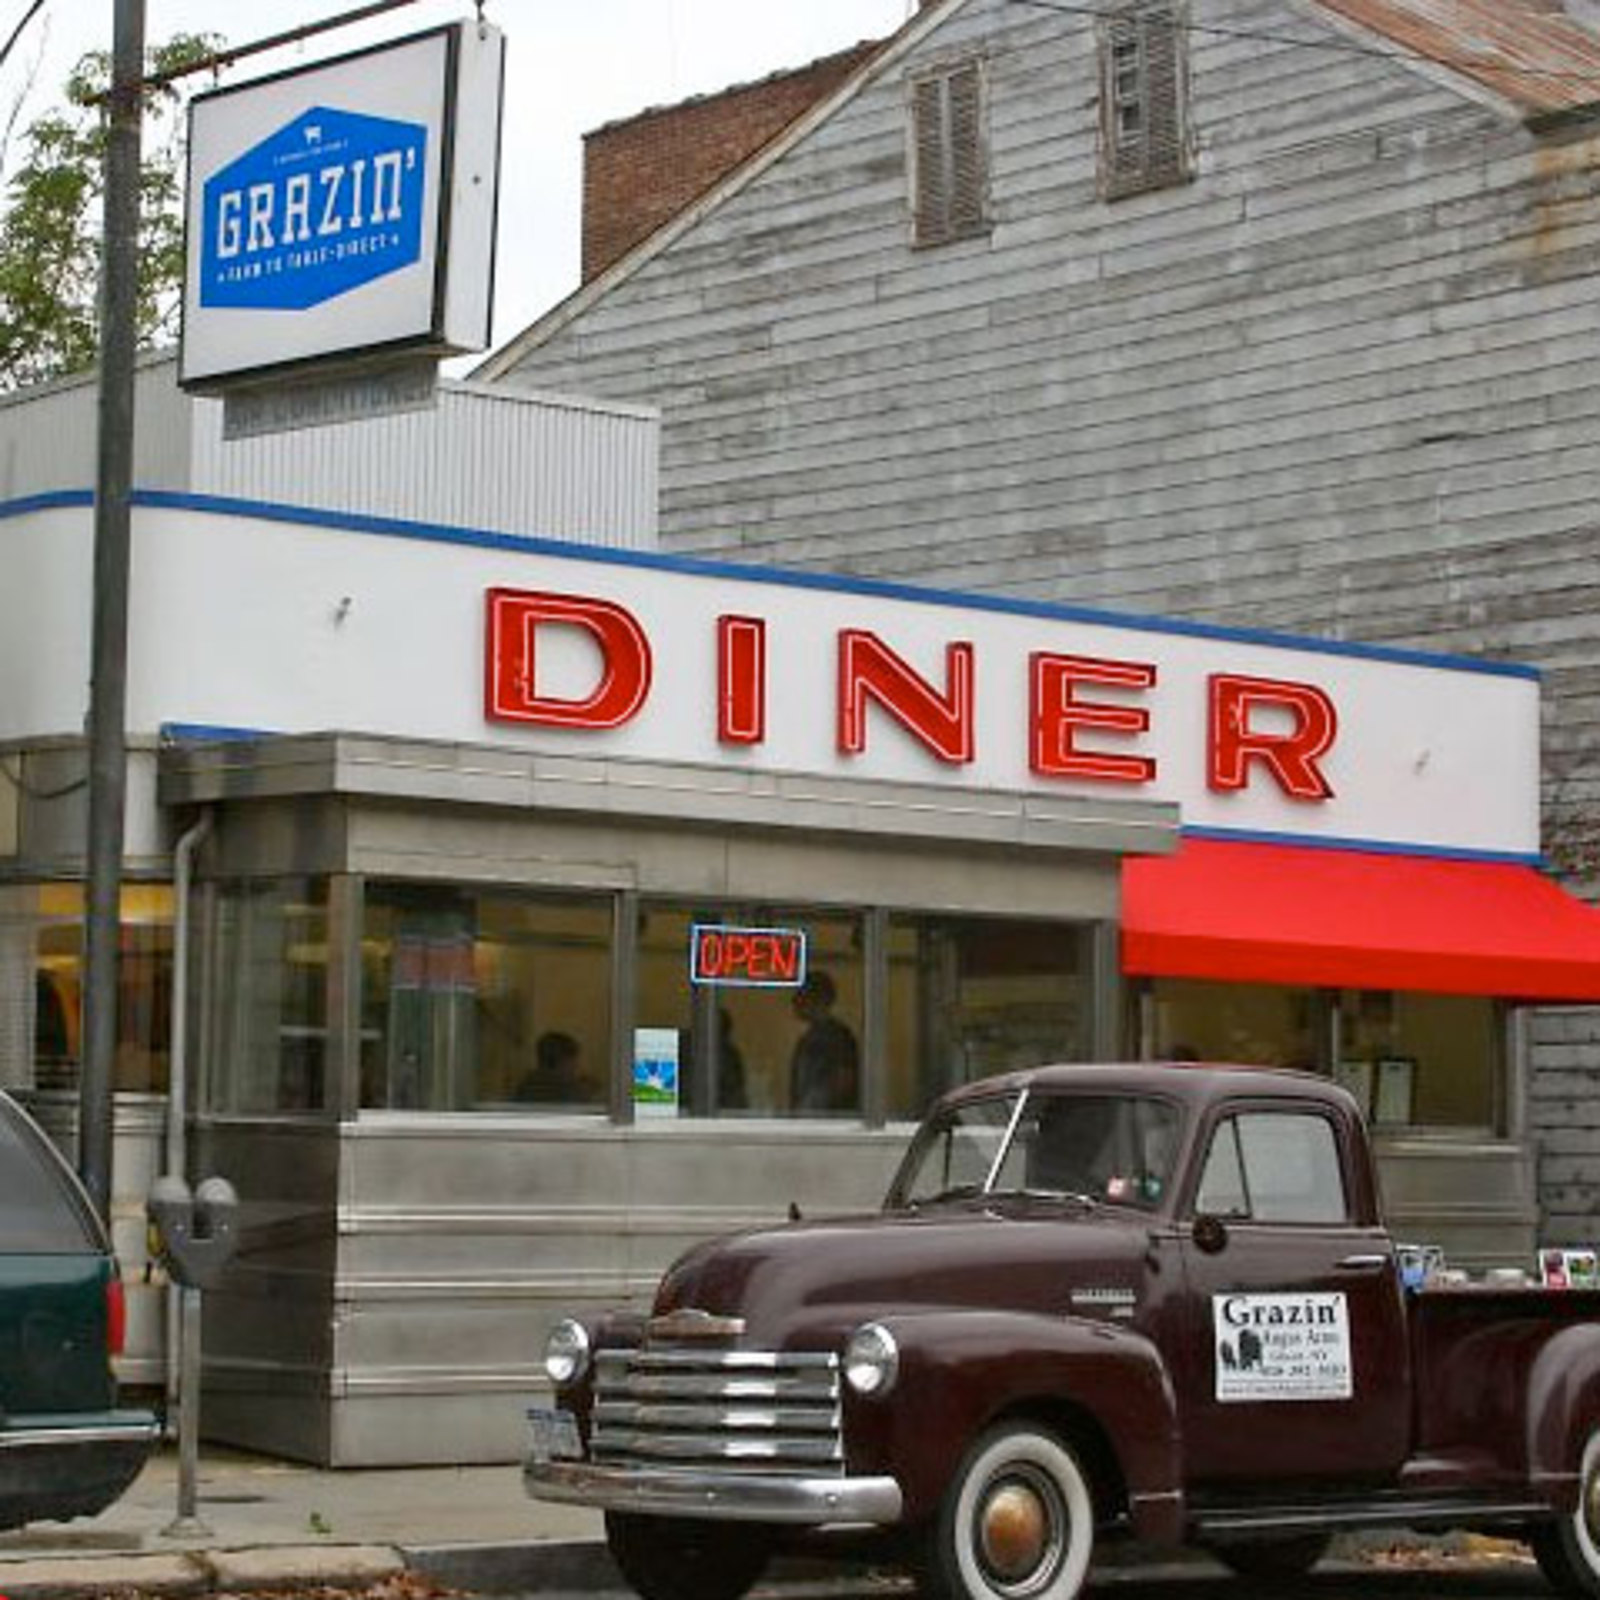 Grazin' Diner - Columbia County Tourism